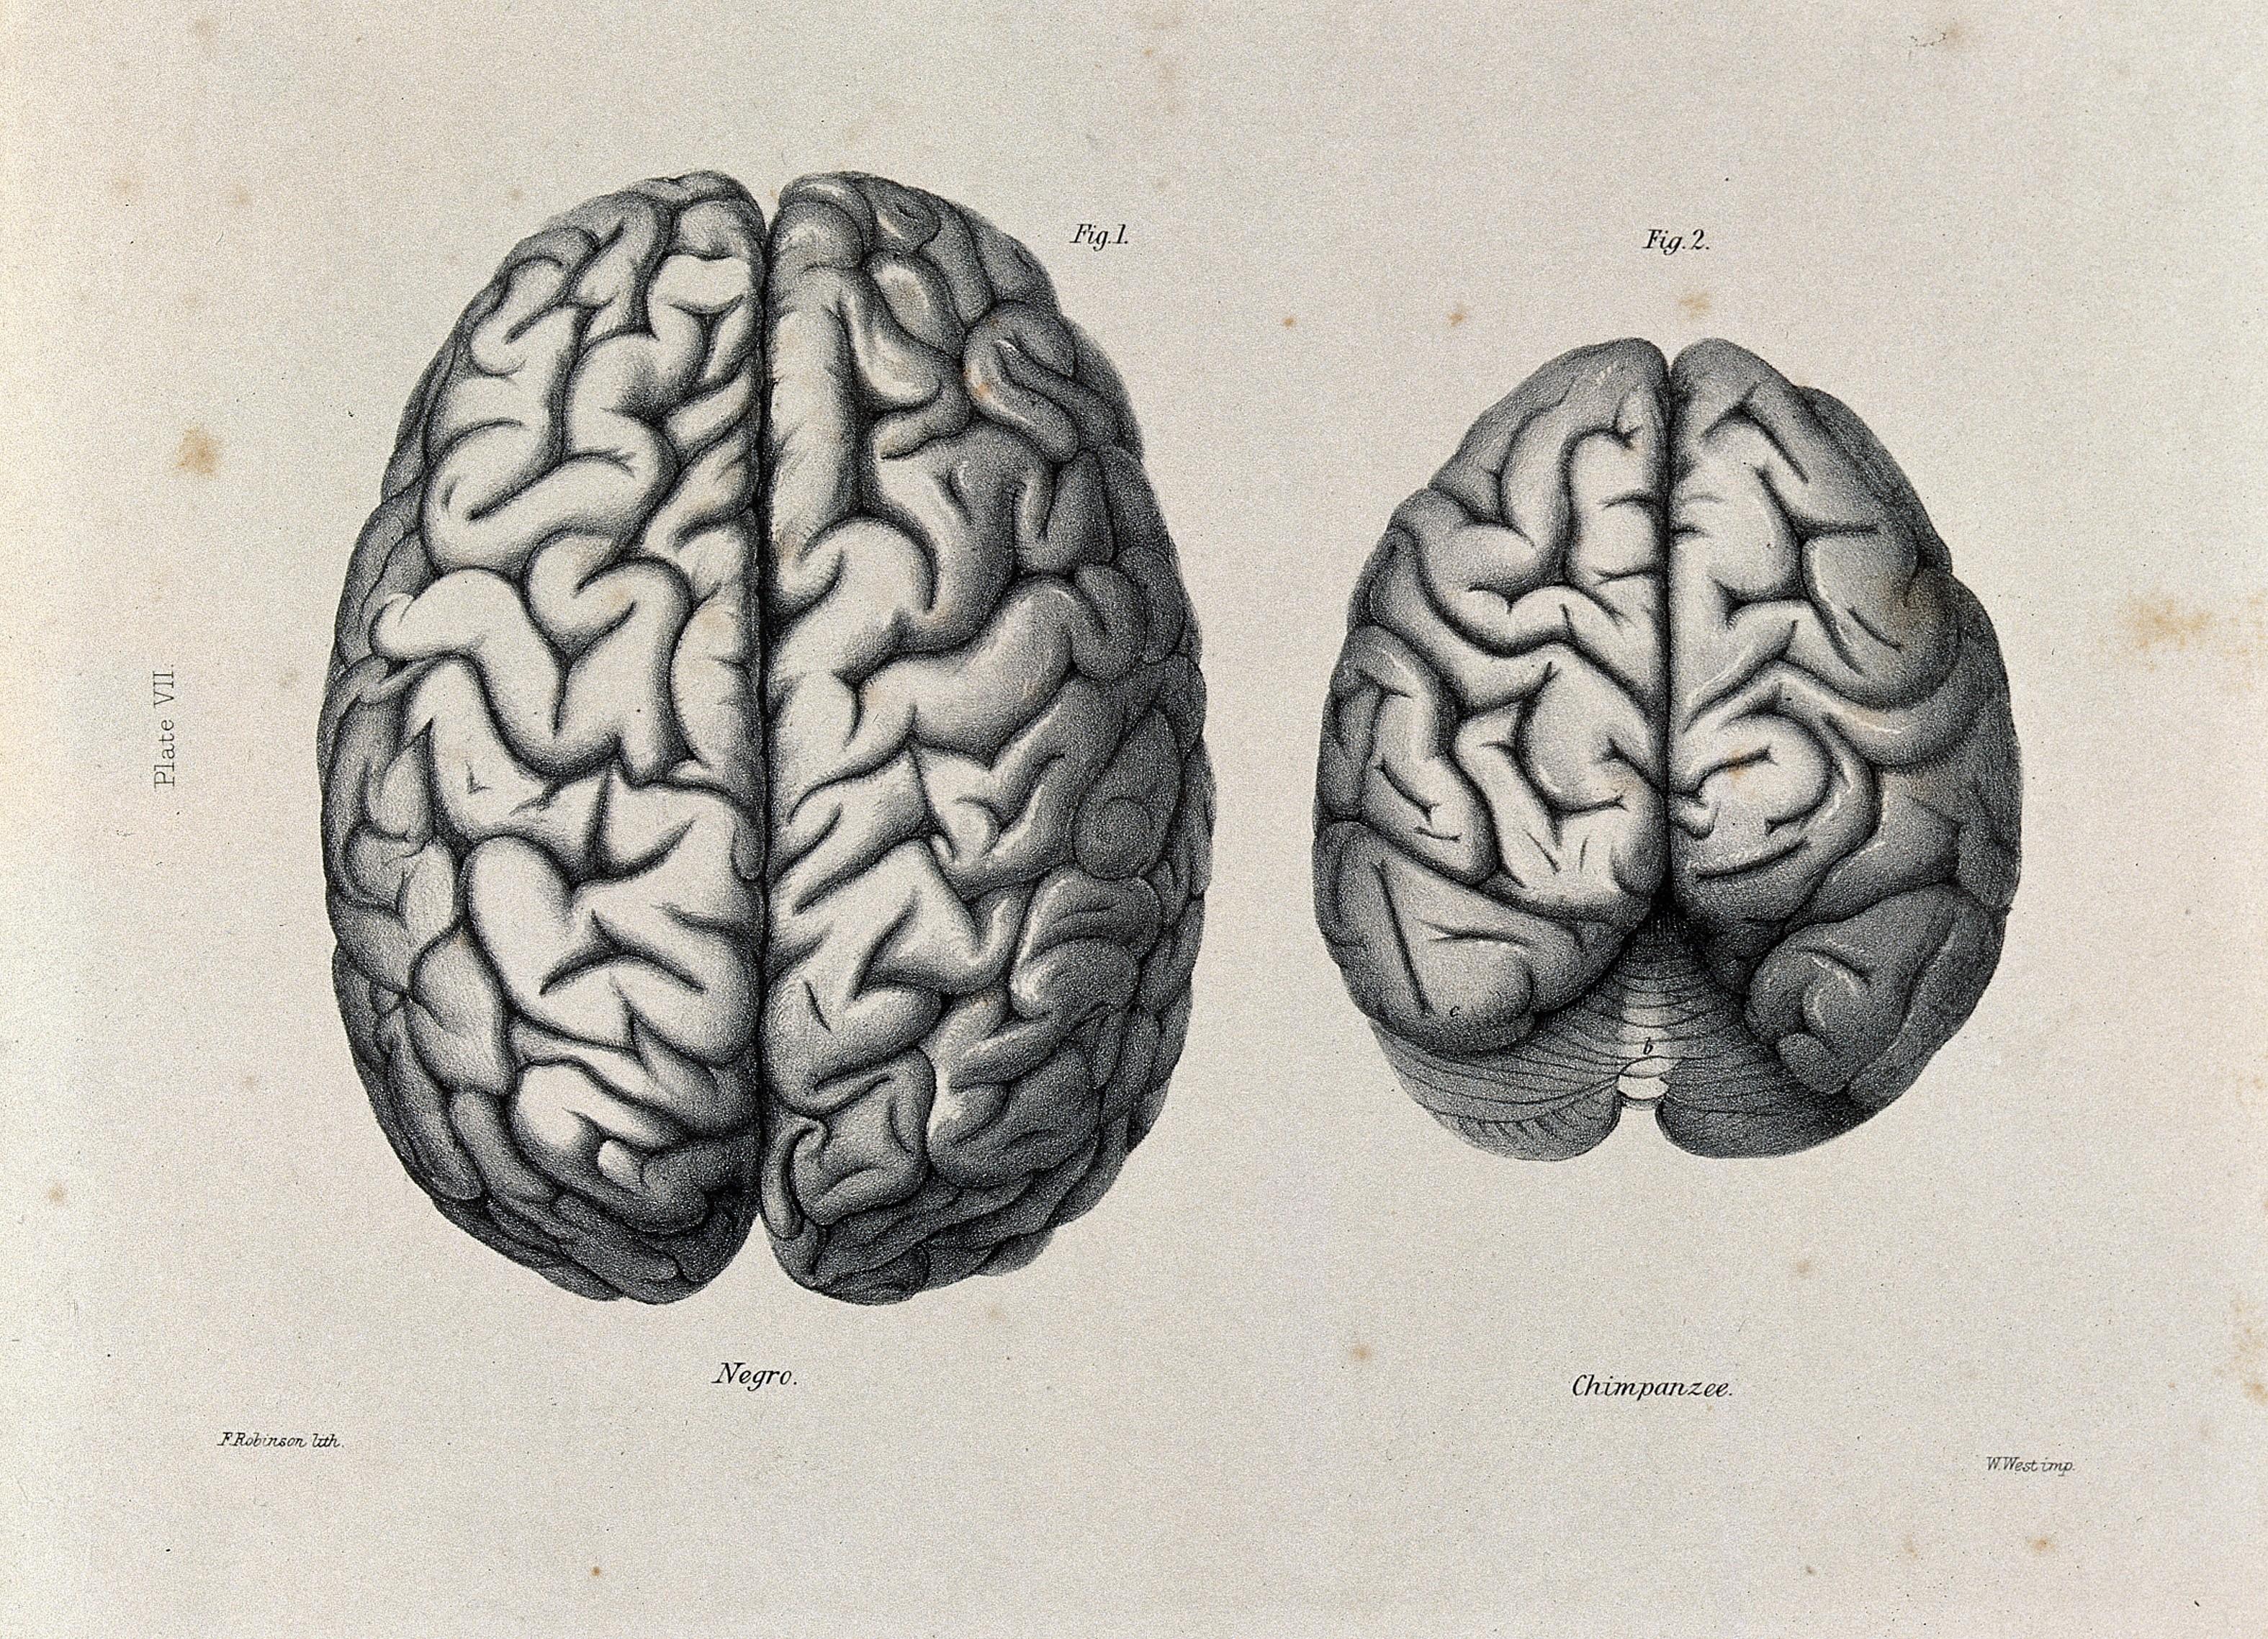 Мозг человека и мозг животного картинки